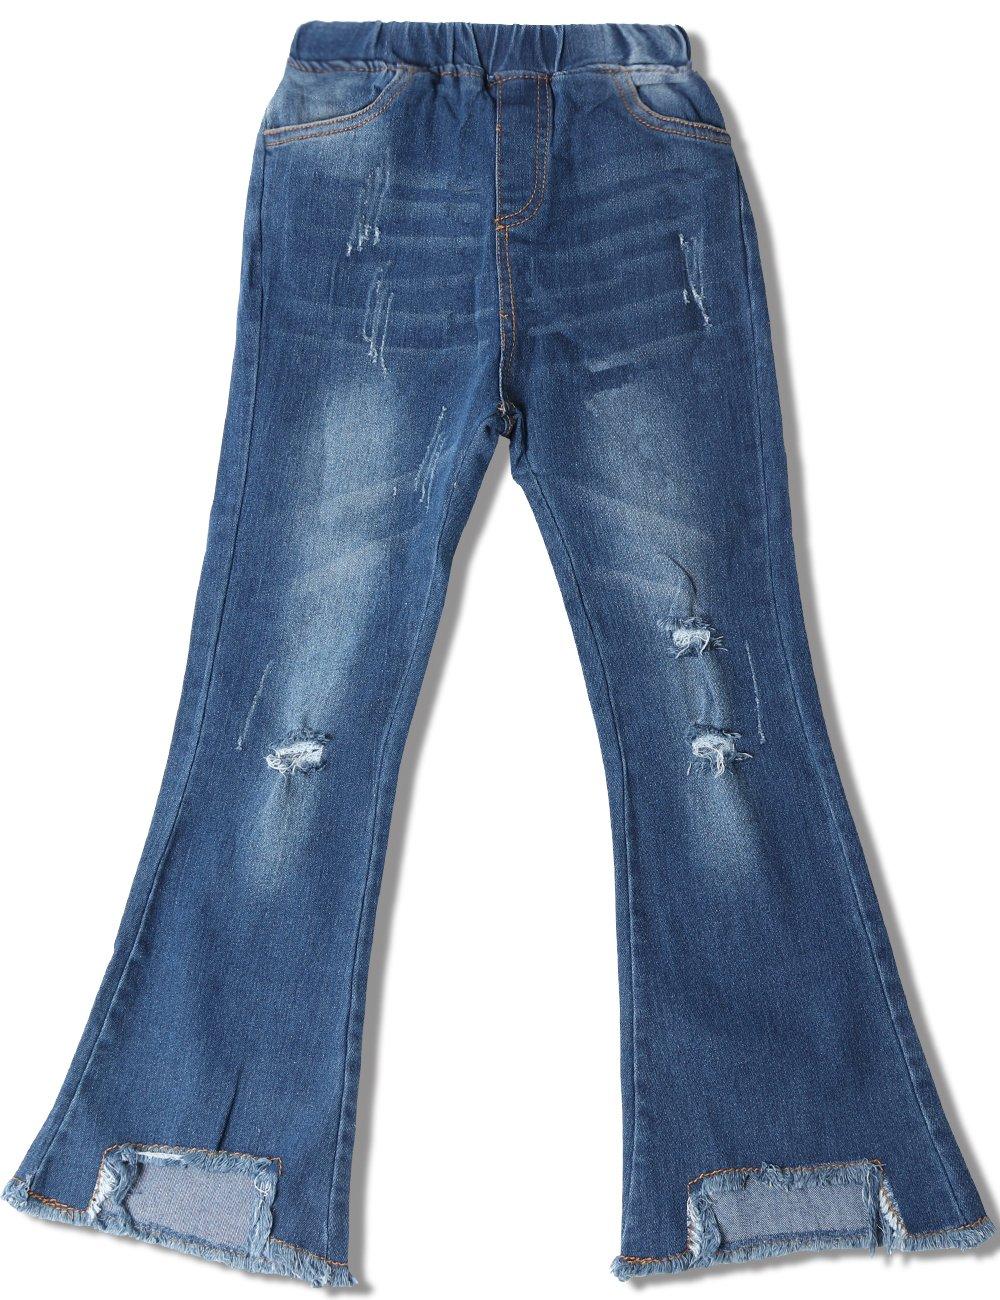 WIYOSHY Girls' Skinny Ripped Bellbottoms Elastic Waist Denim Jeans F919 (Blue, 10/12 (150))